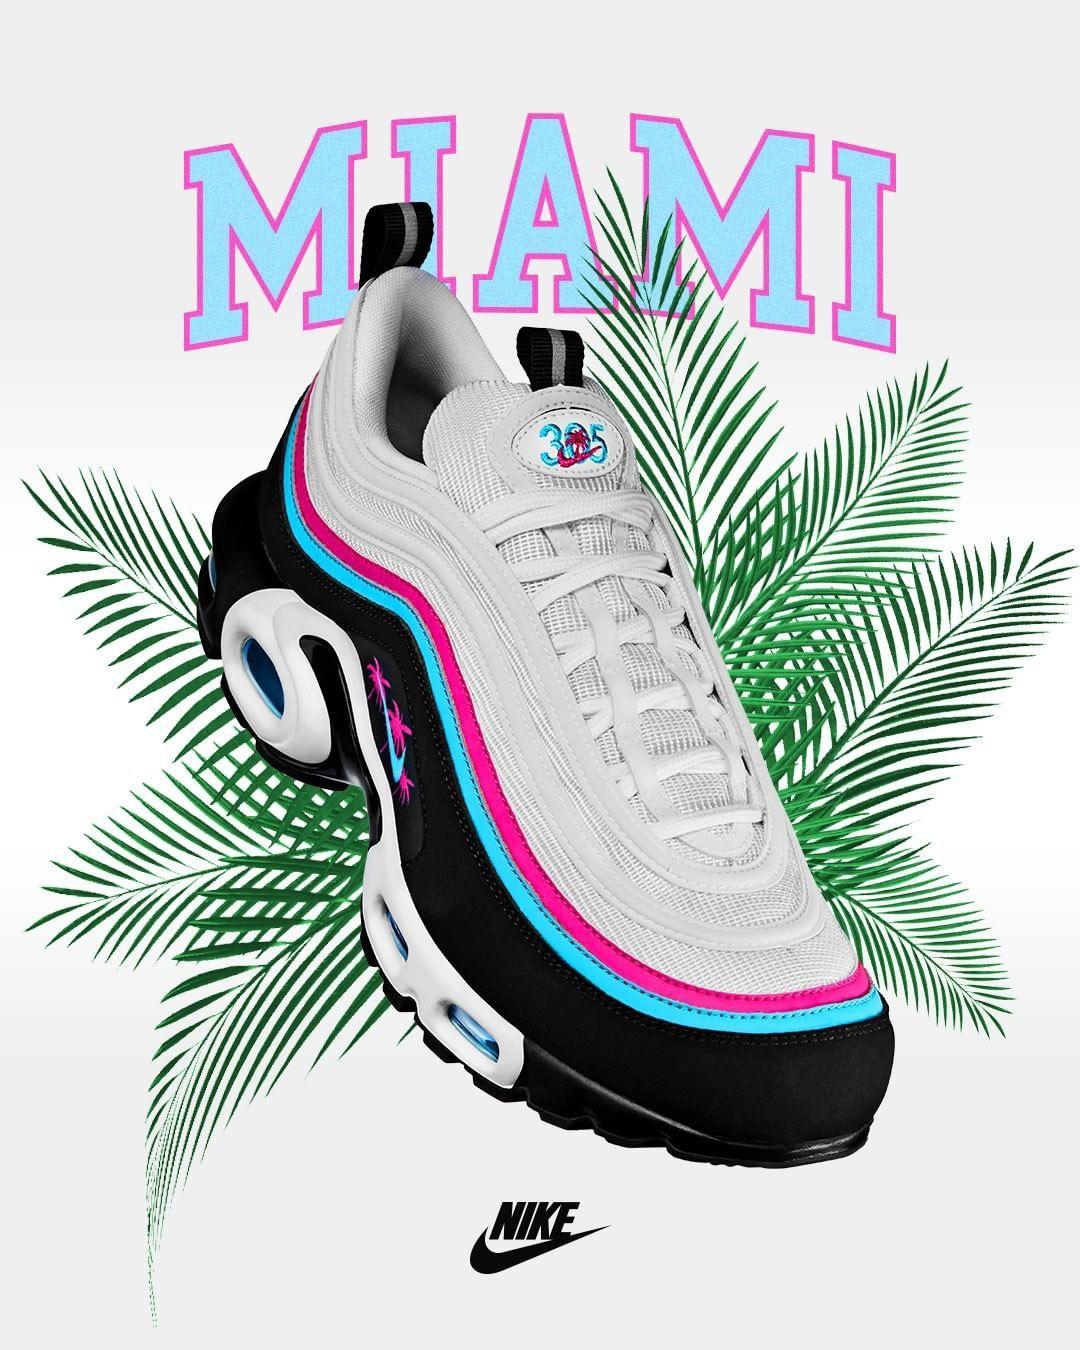 Nike air Max plus '97 away Miami | Nike air max, Air max